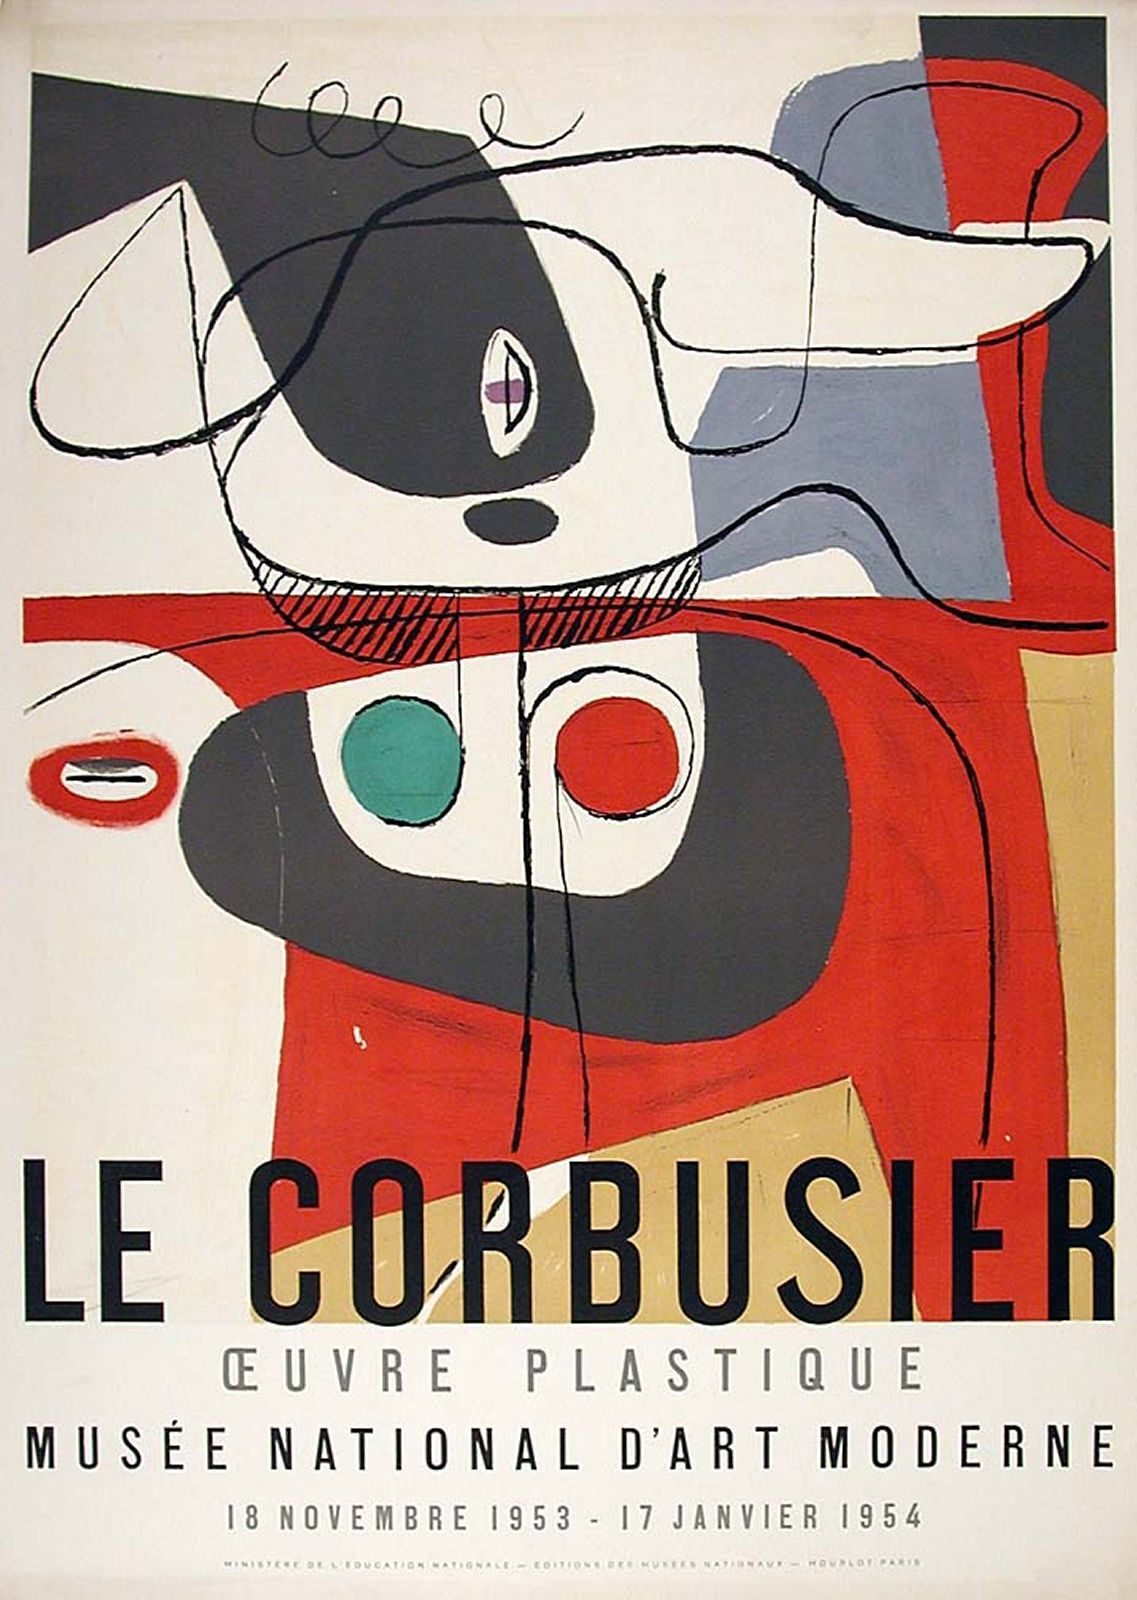 le corbusier oeuvre plastique museums and exhibits museograf a y exhibiciones pinterest. Black Bedroom Furniture Sets. Home Design Ideas